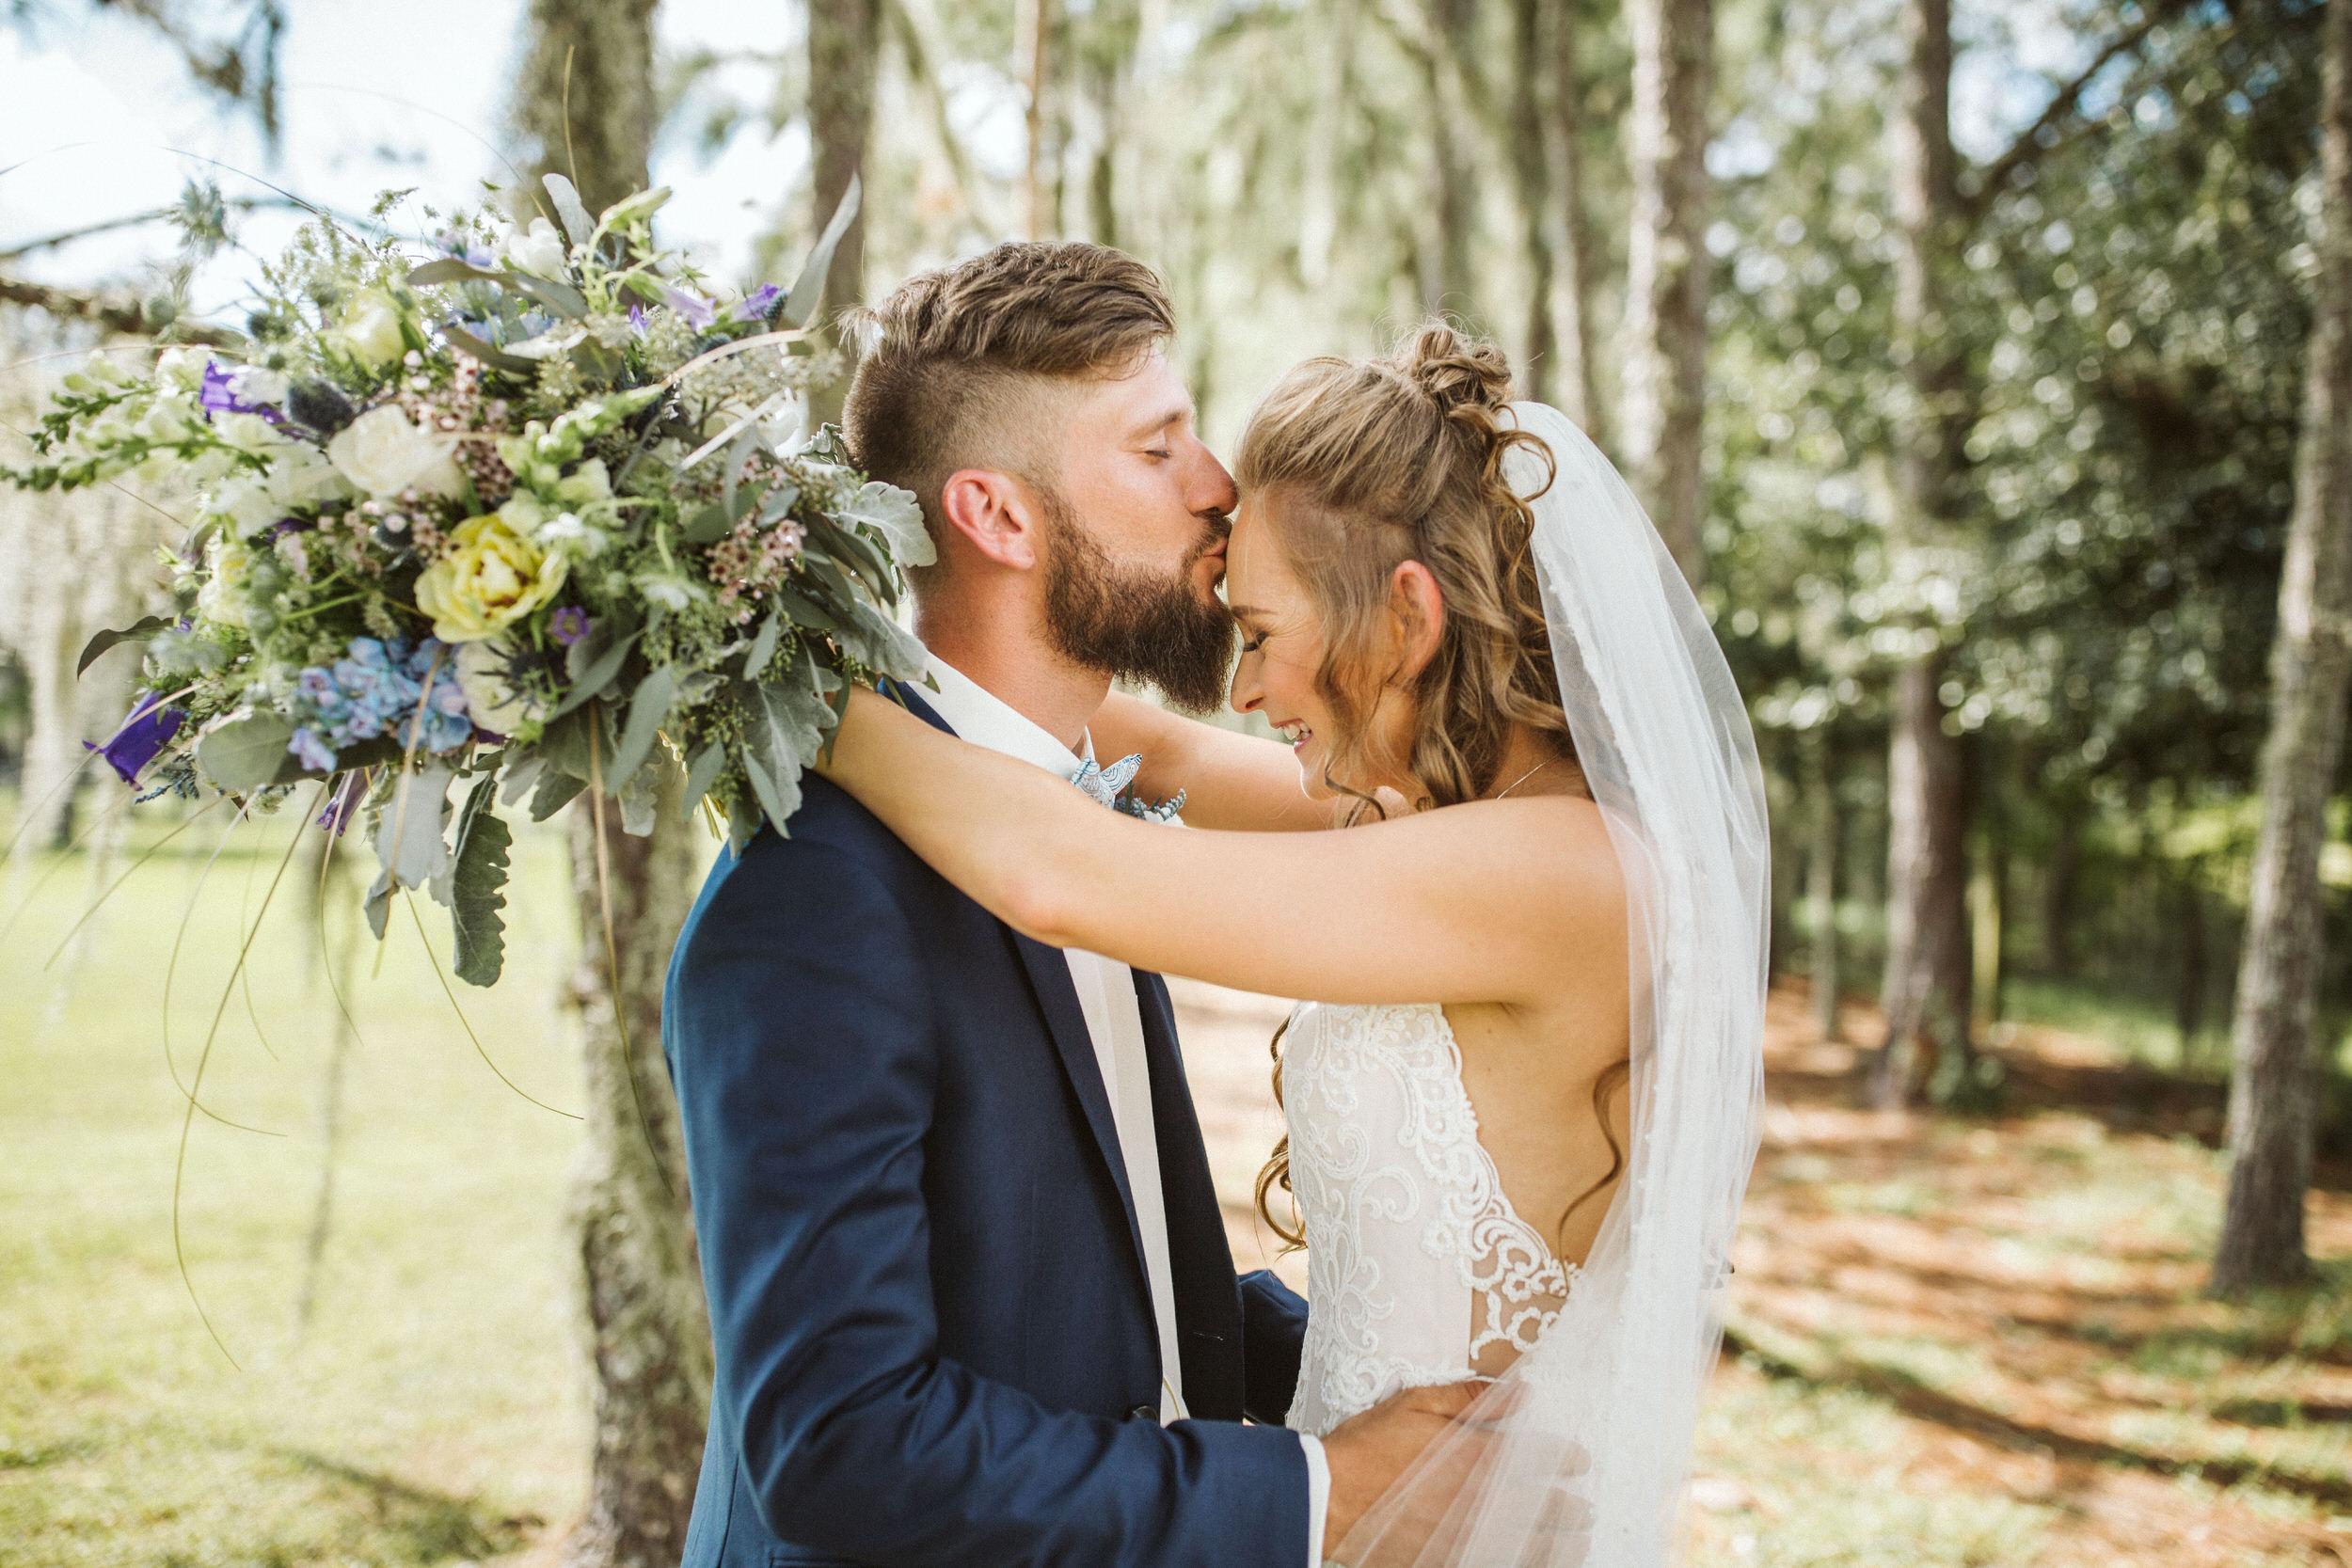 Bohemian Backyard Wedding- Sarasota- Courtney + Isaac- Photographer Shaina DeCiryan11.jpg